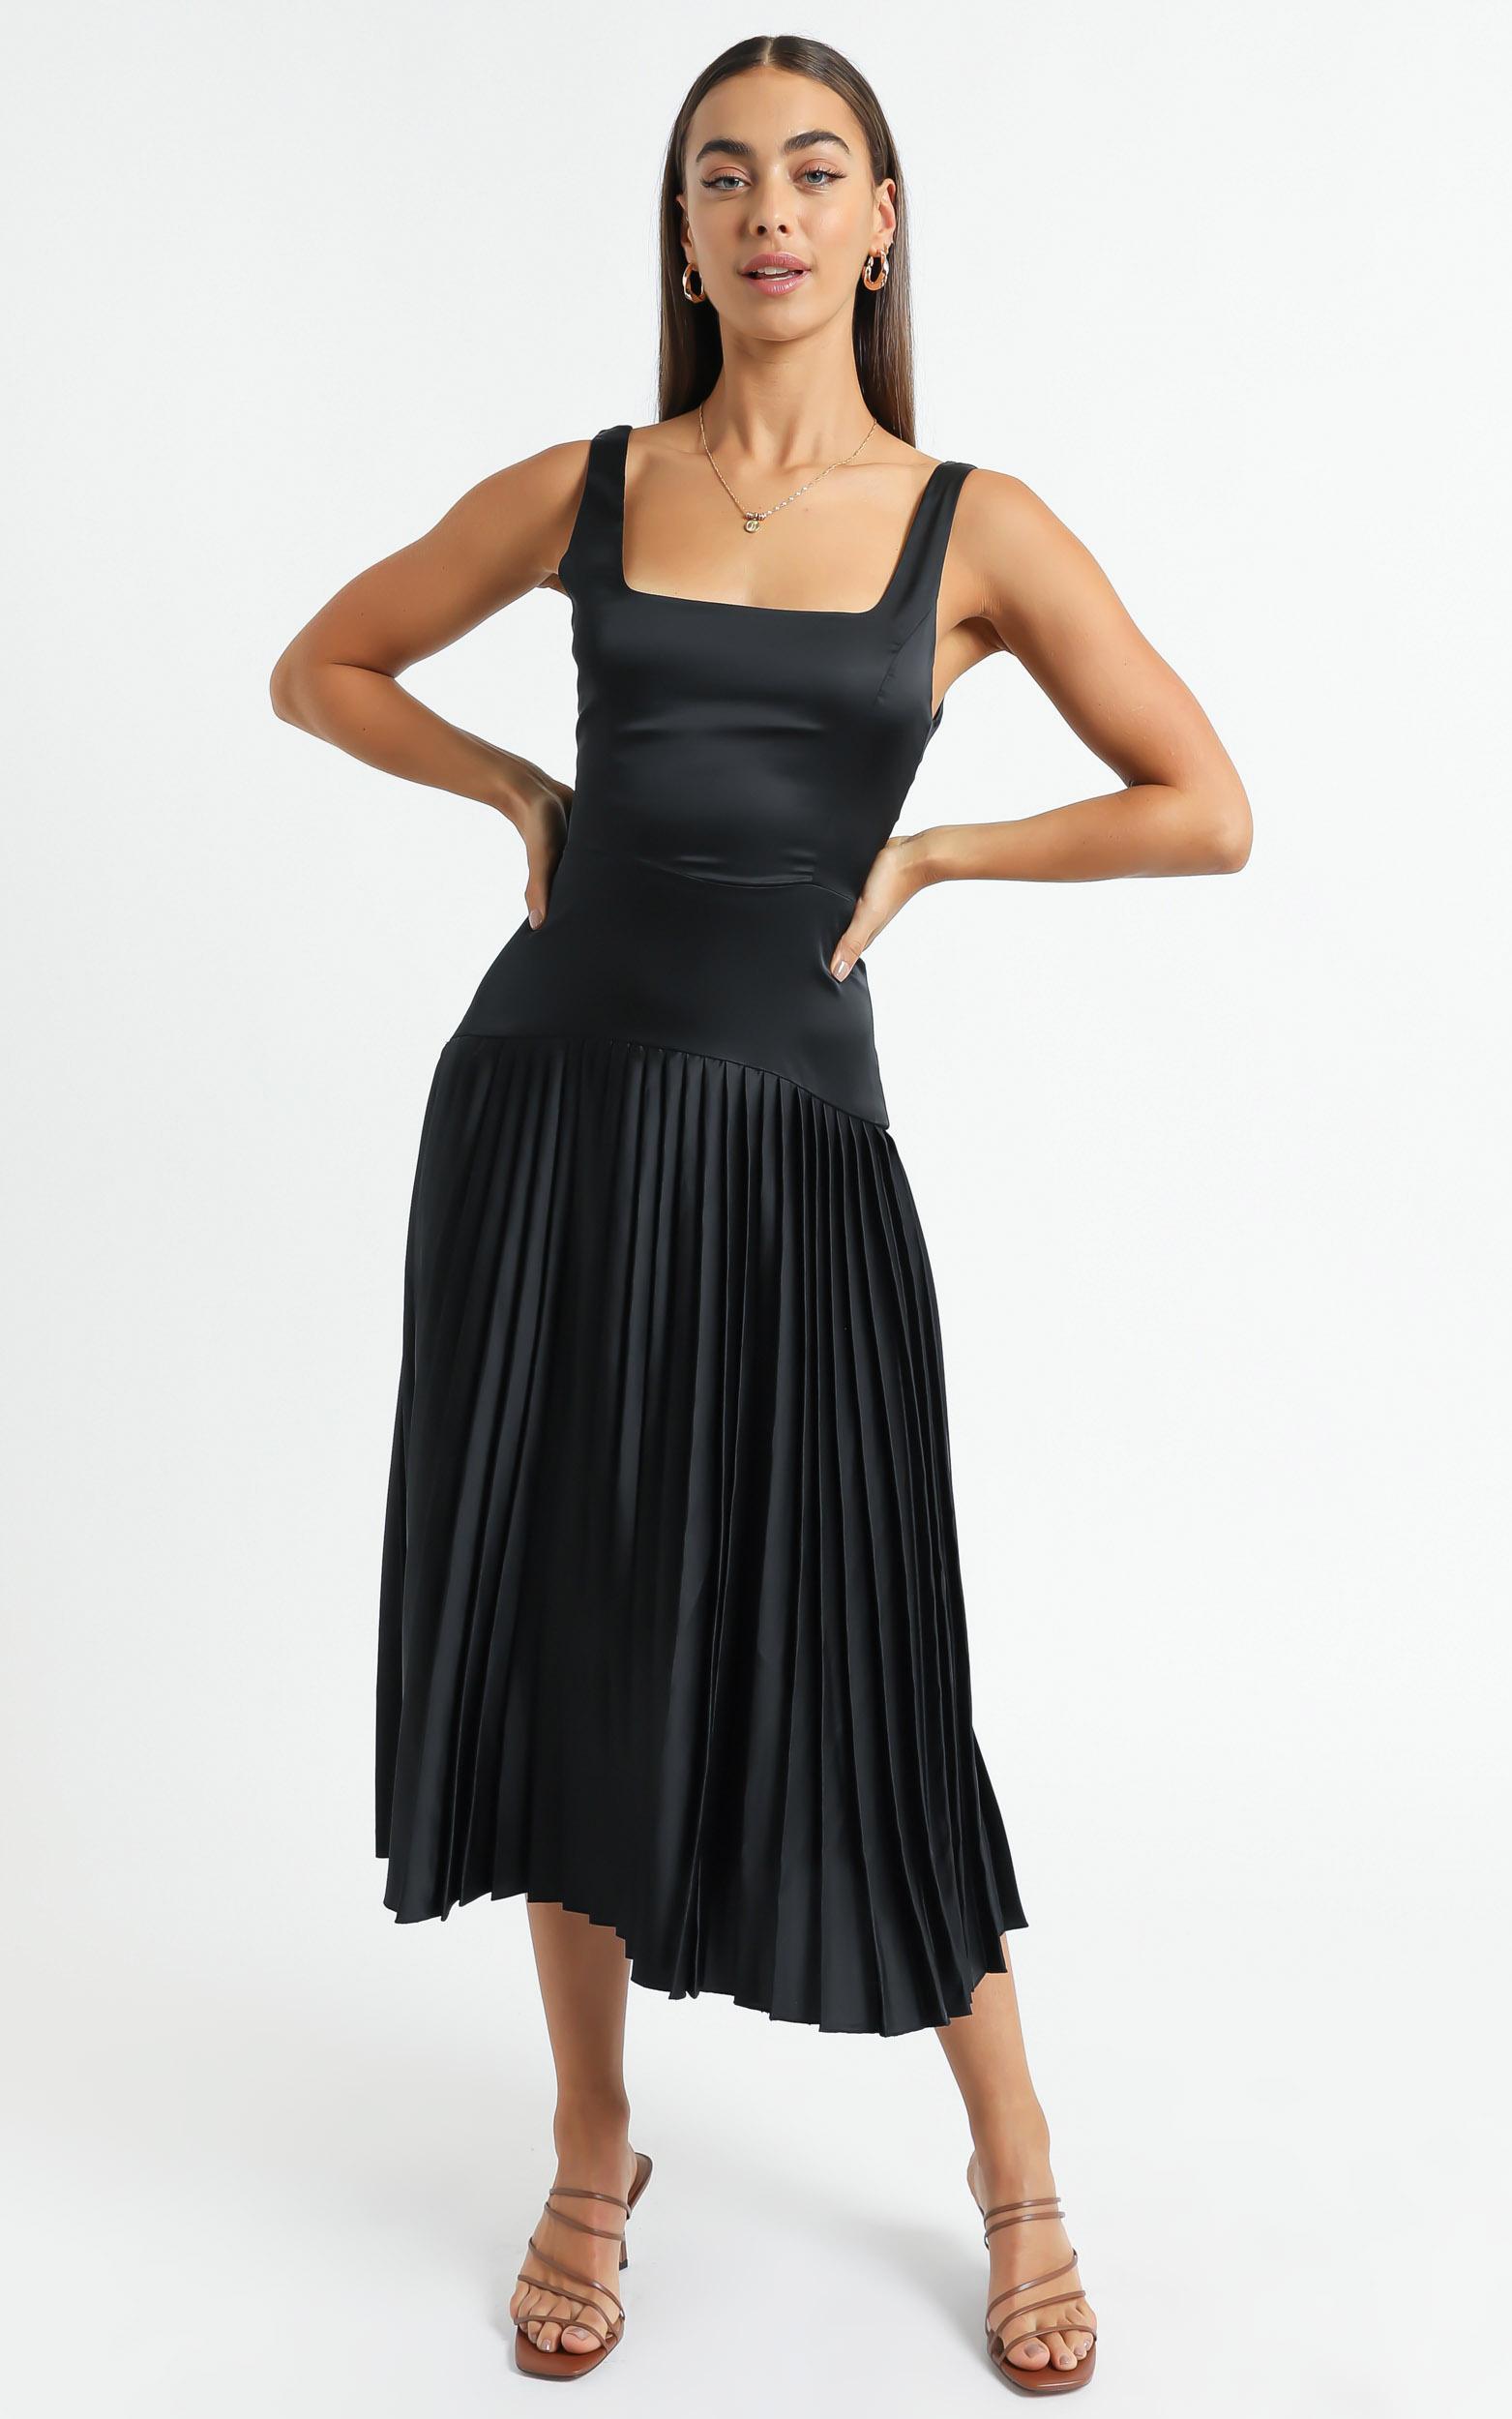 Sassa Dress in Black - 6 (XS), Black, hi-res image number null